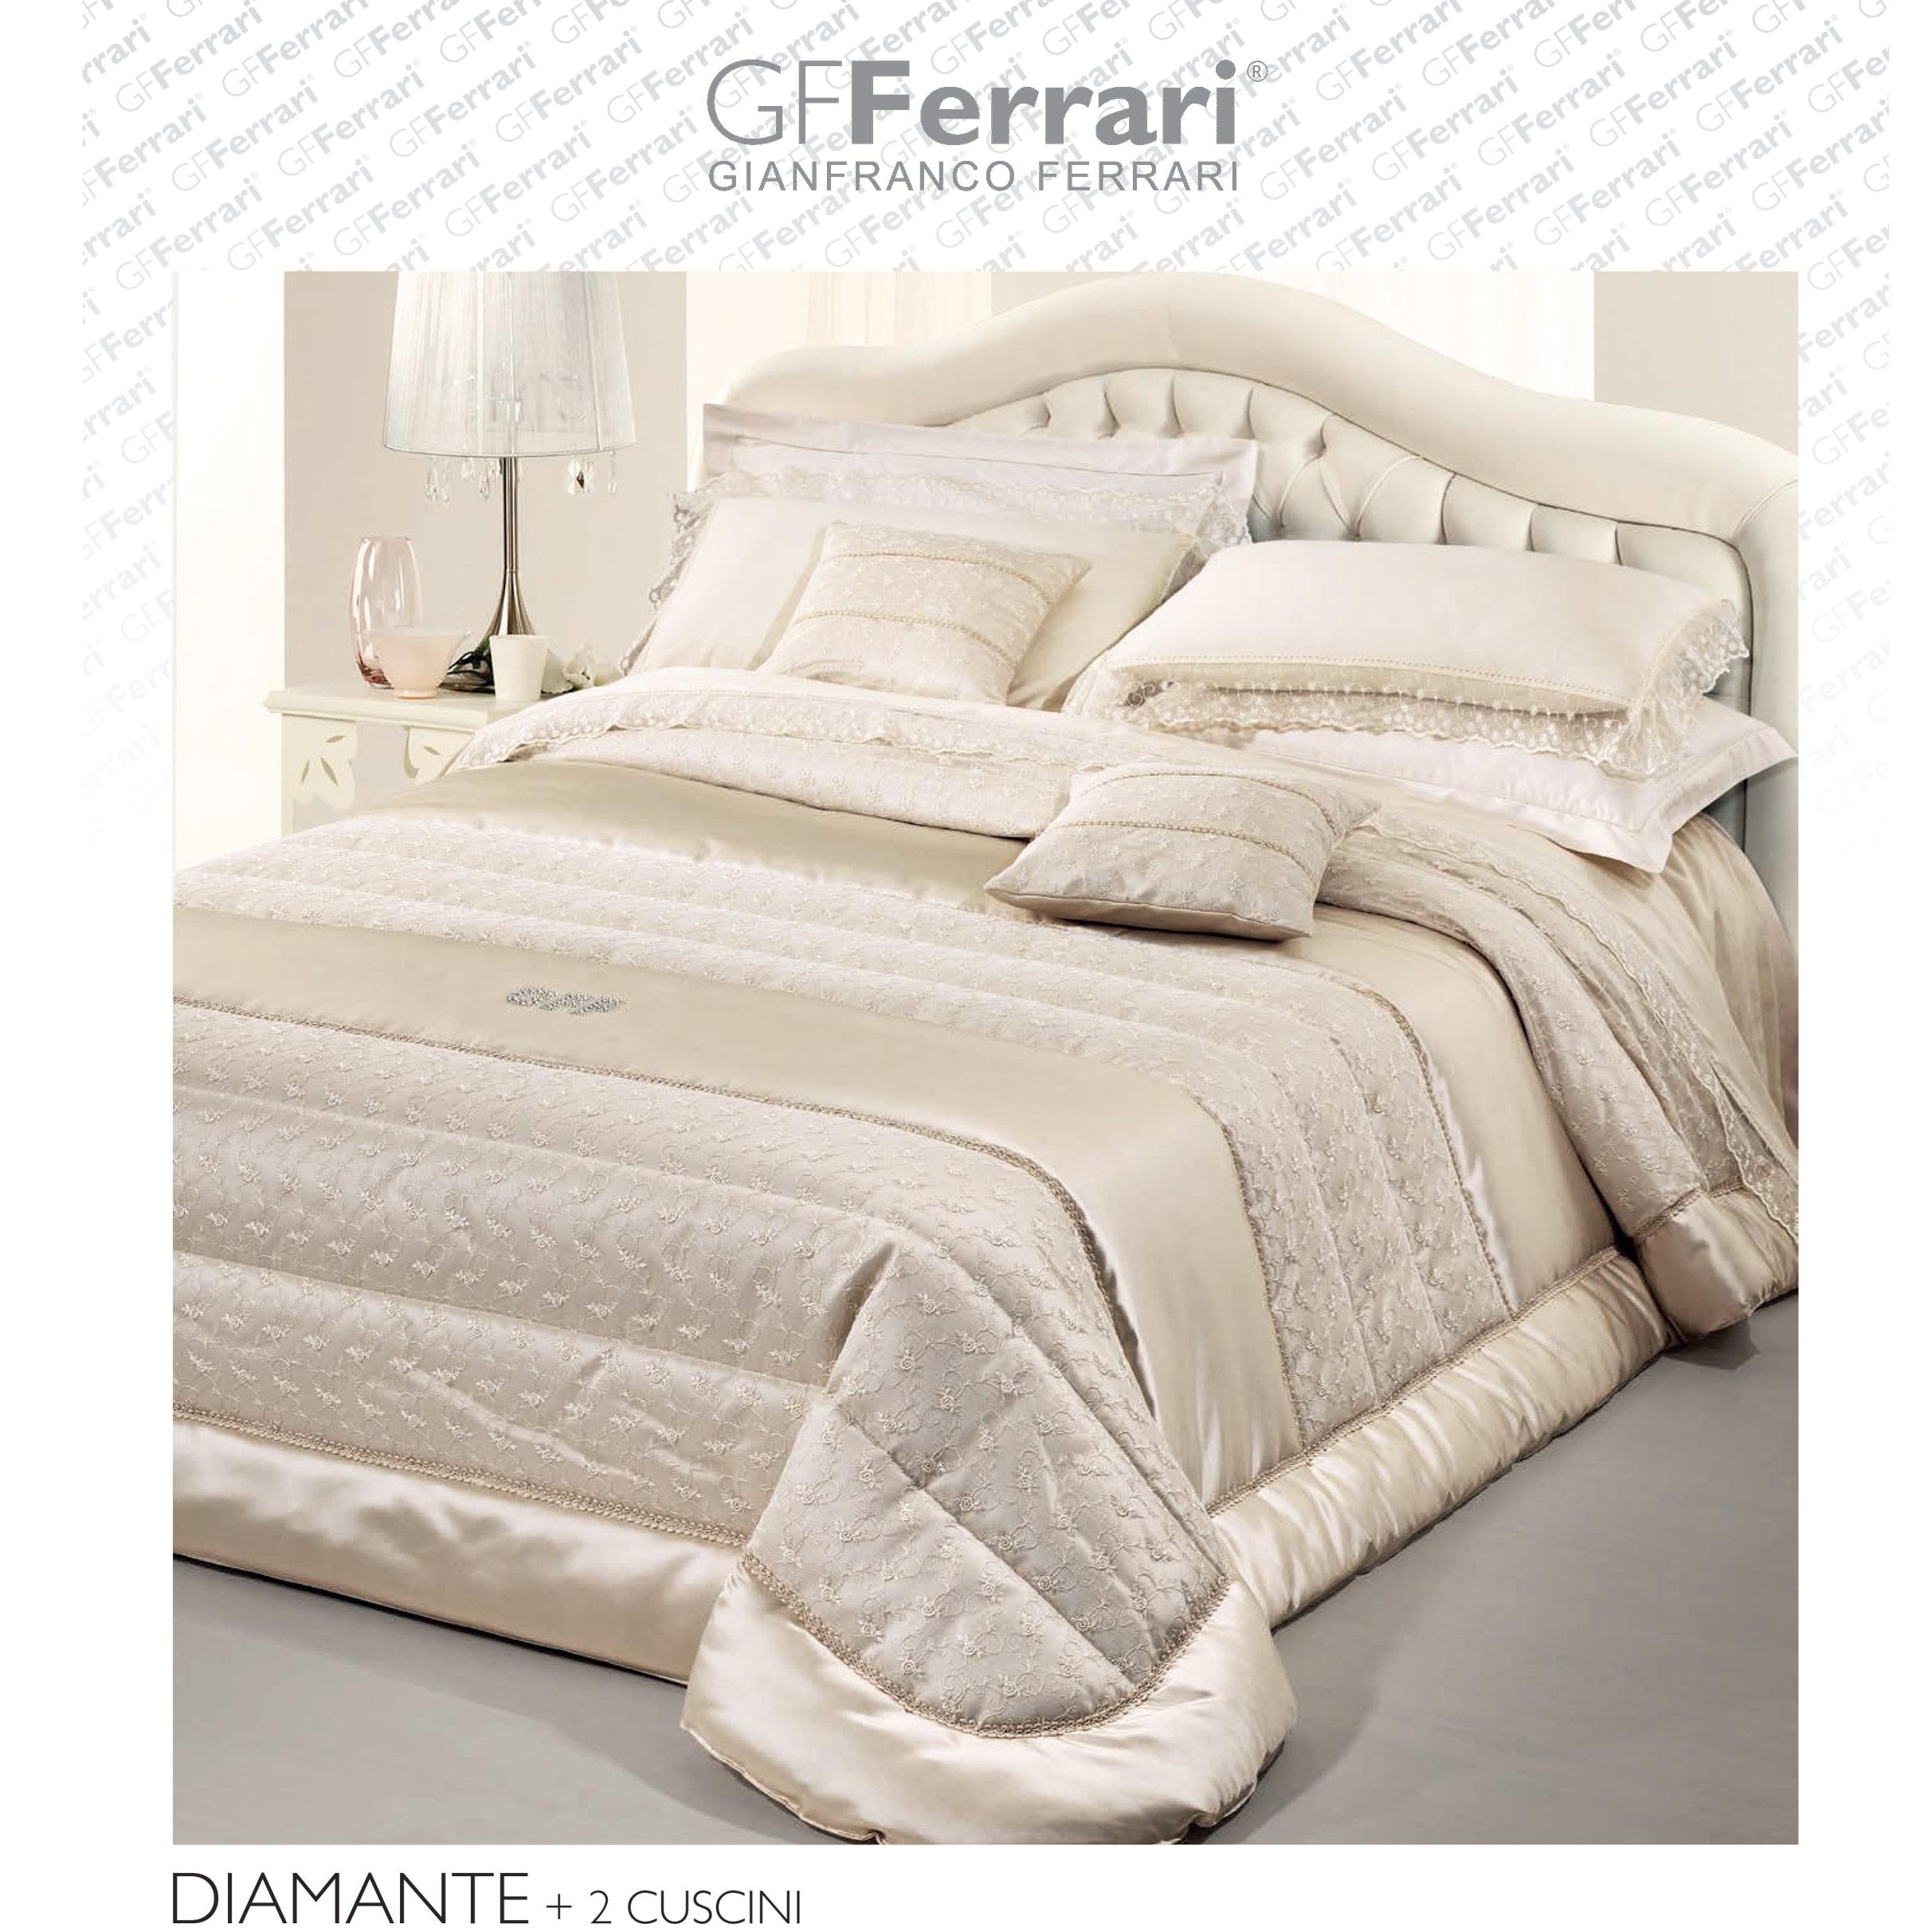 Piumone Matrimoniale Gf Ferrari.Trapunta Matrimoniale Diamante Gf Ferrari Solo 1 Pezzo Disponibile Punto Bianco